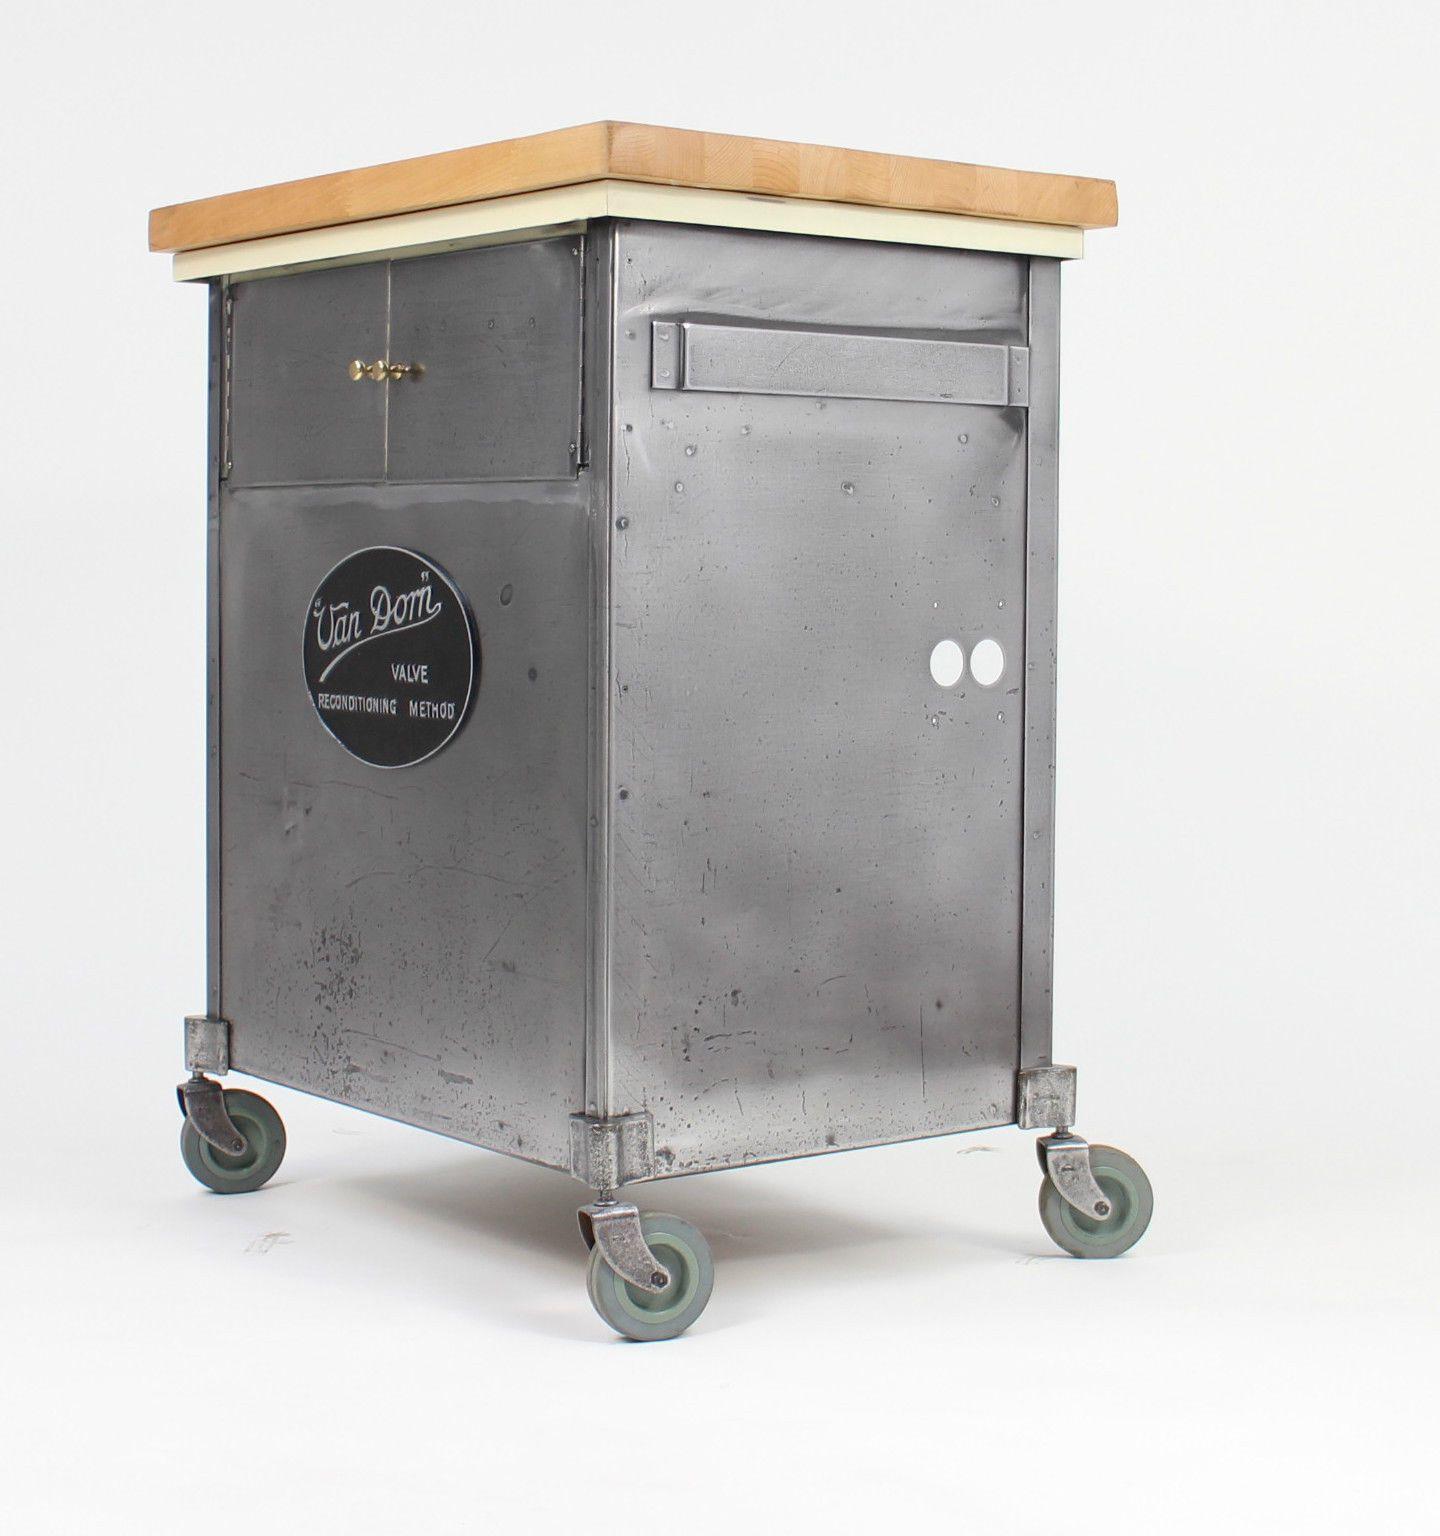 Steel Kitchen Island Mobile kitchen unit Fully restored engineers